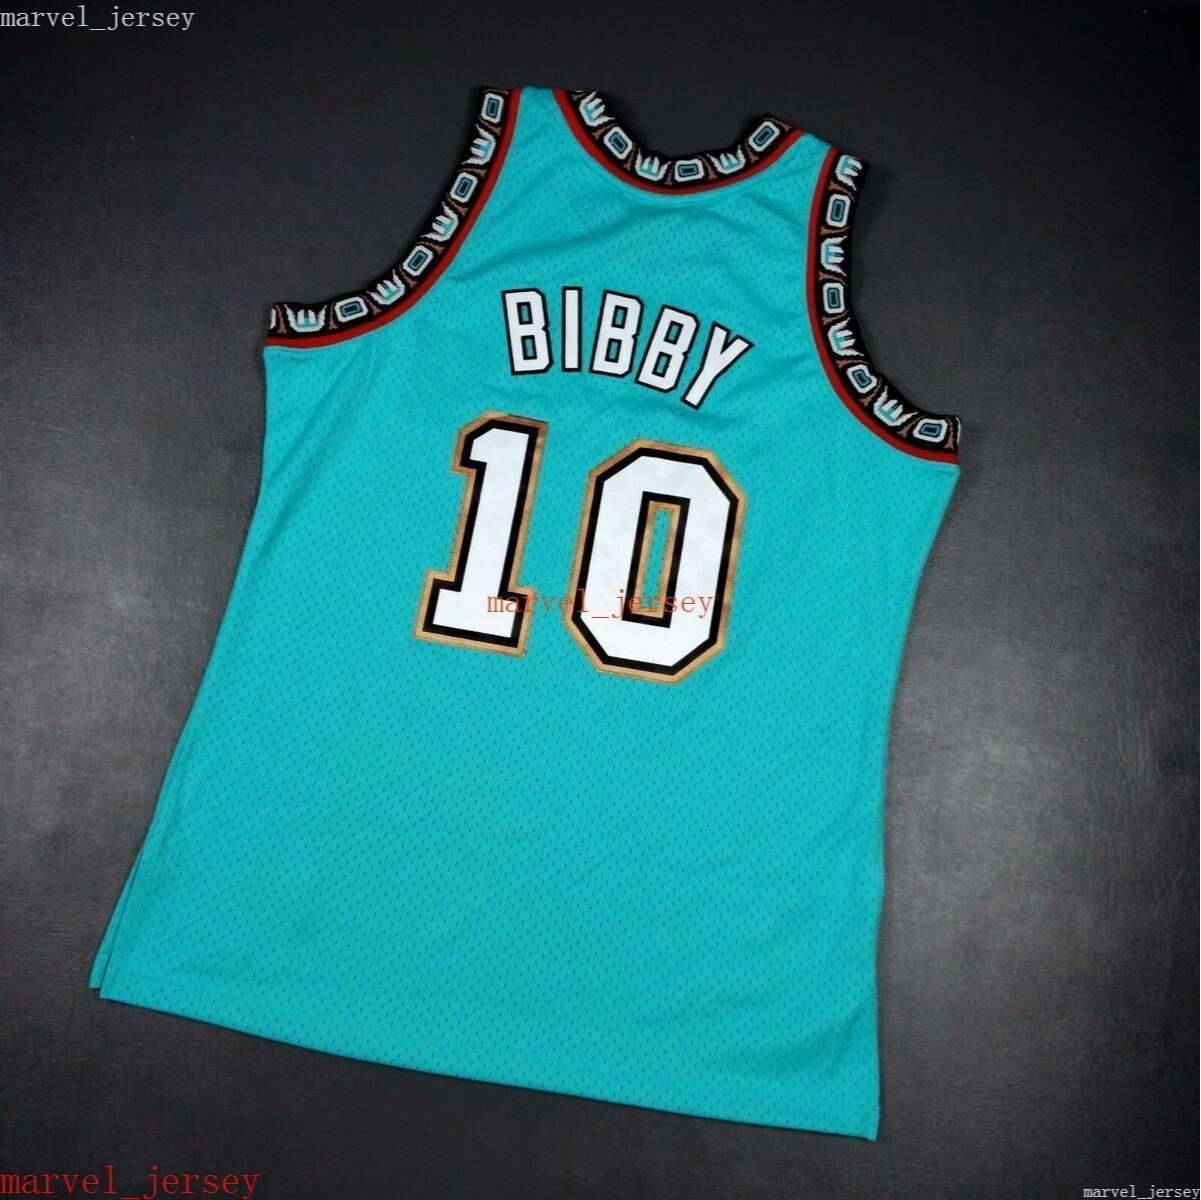 100% Stitched Mike Bibby Mitchell Ness 98 99 Jersey XS-6XL Mens Throwbacks Basketball jerseys Cheap Men Women Youth